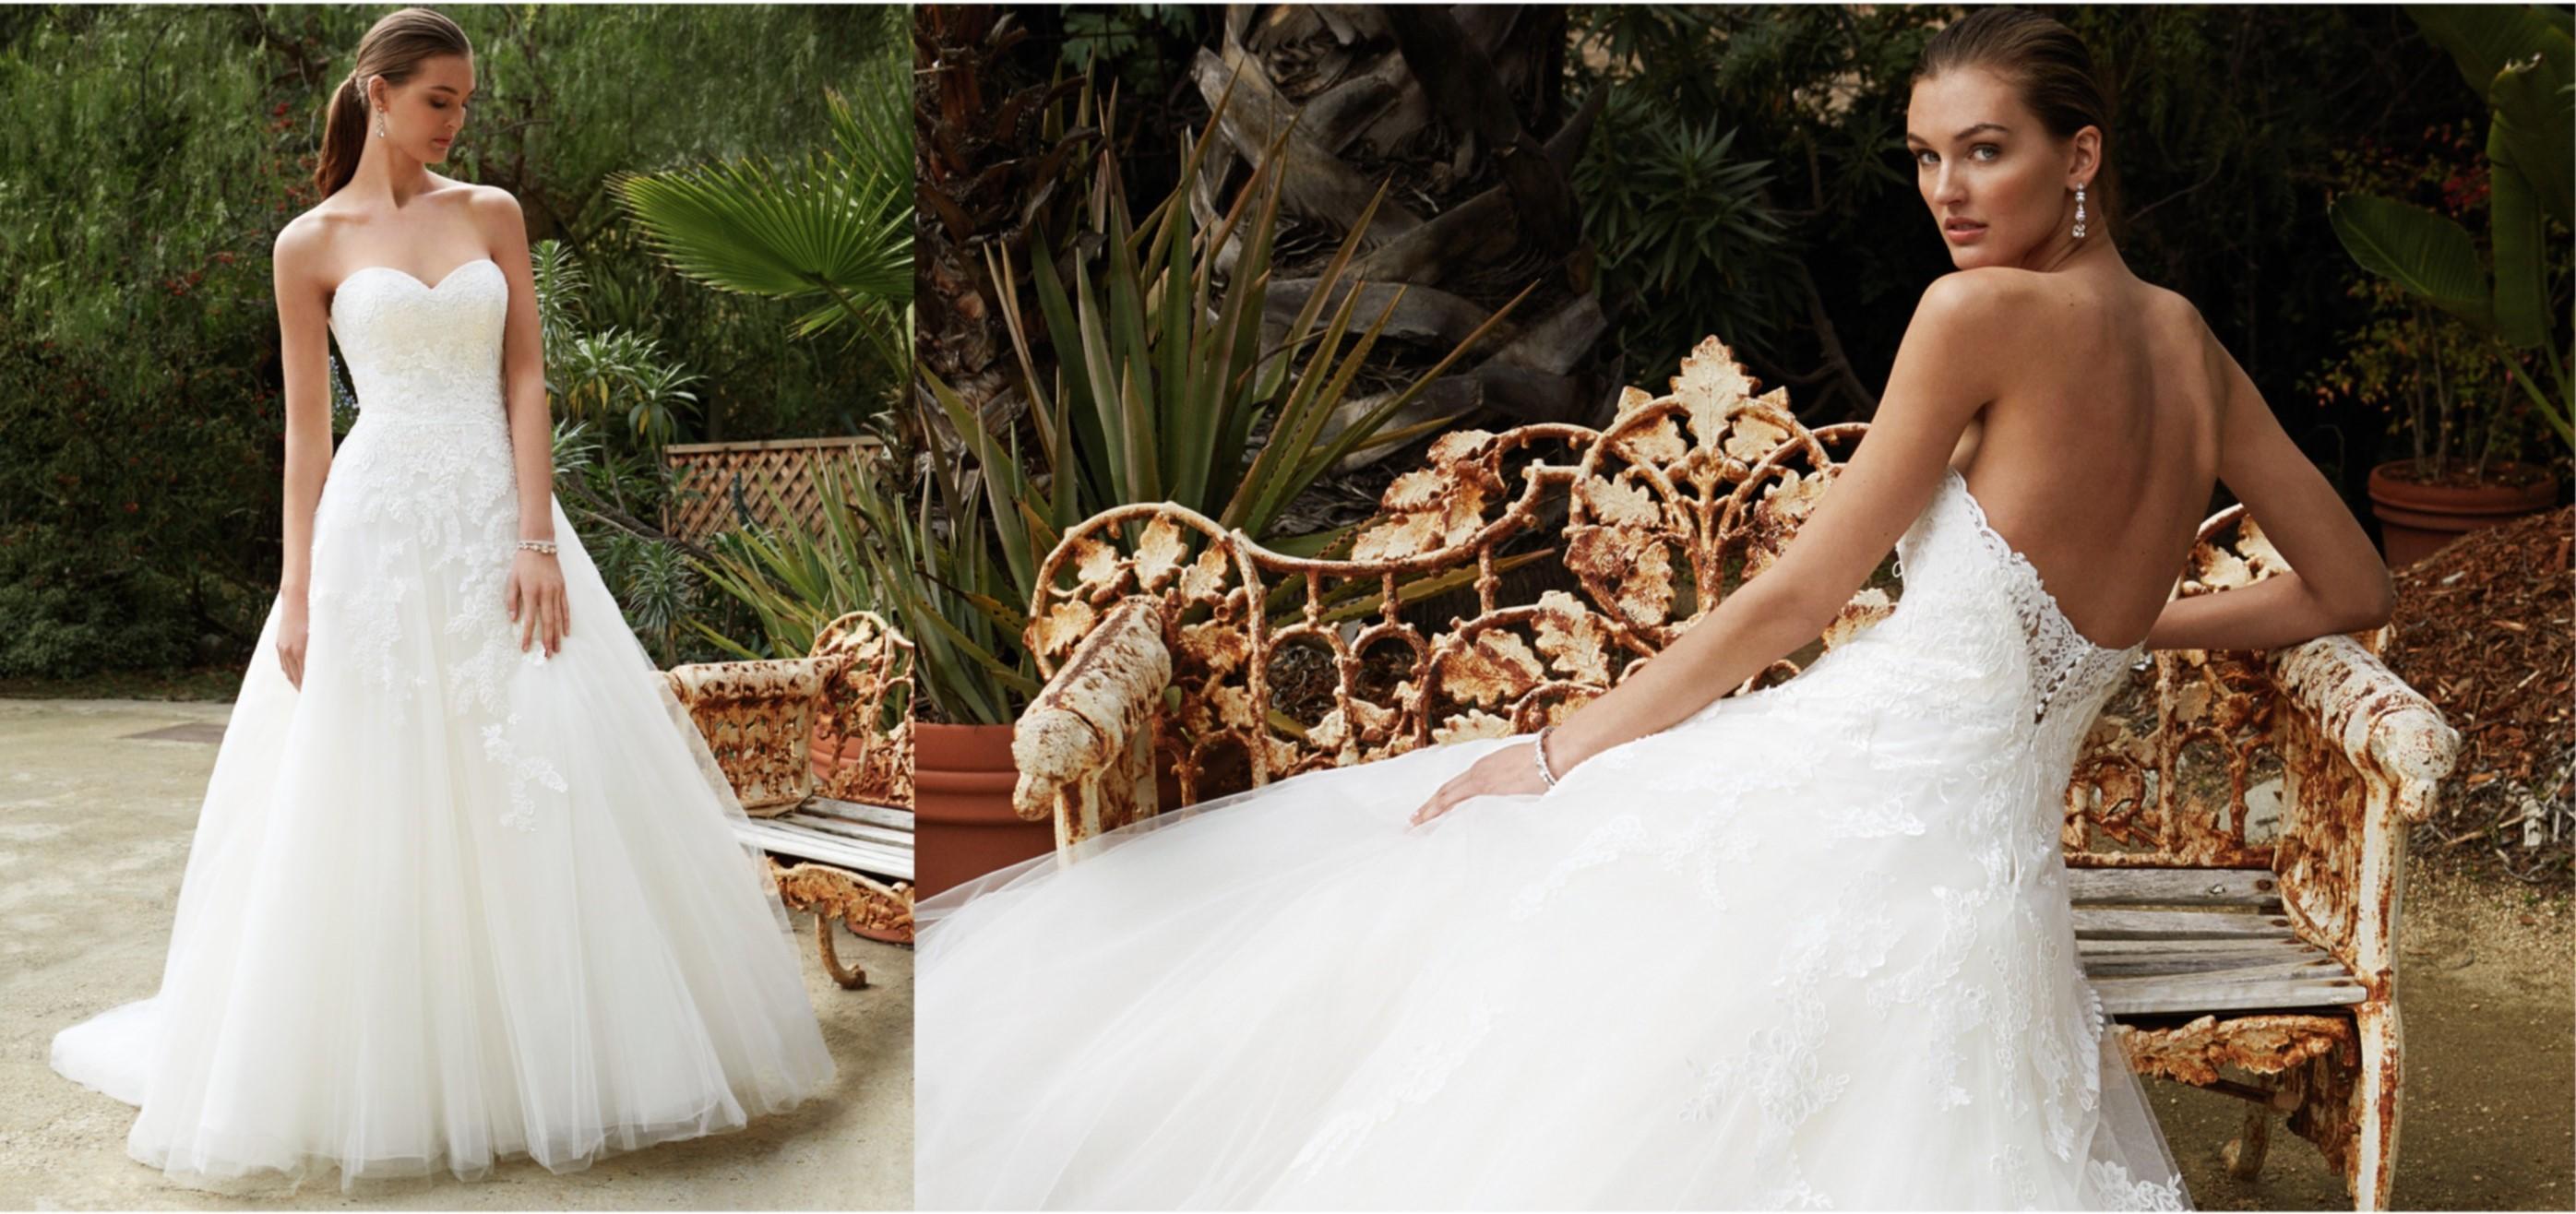 Beautiful Bridesmaid Dresses Durban Image